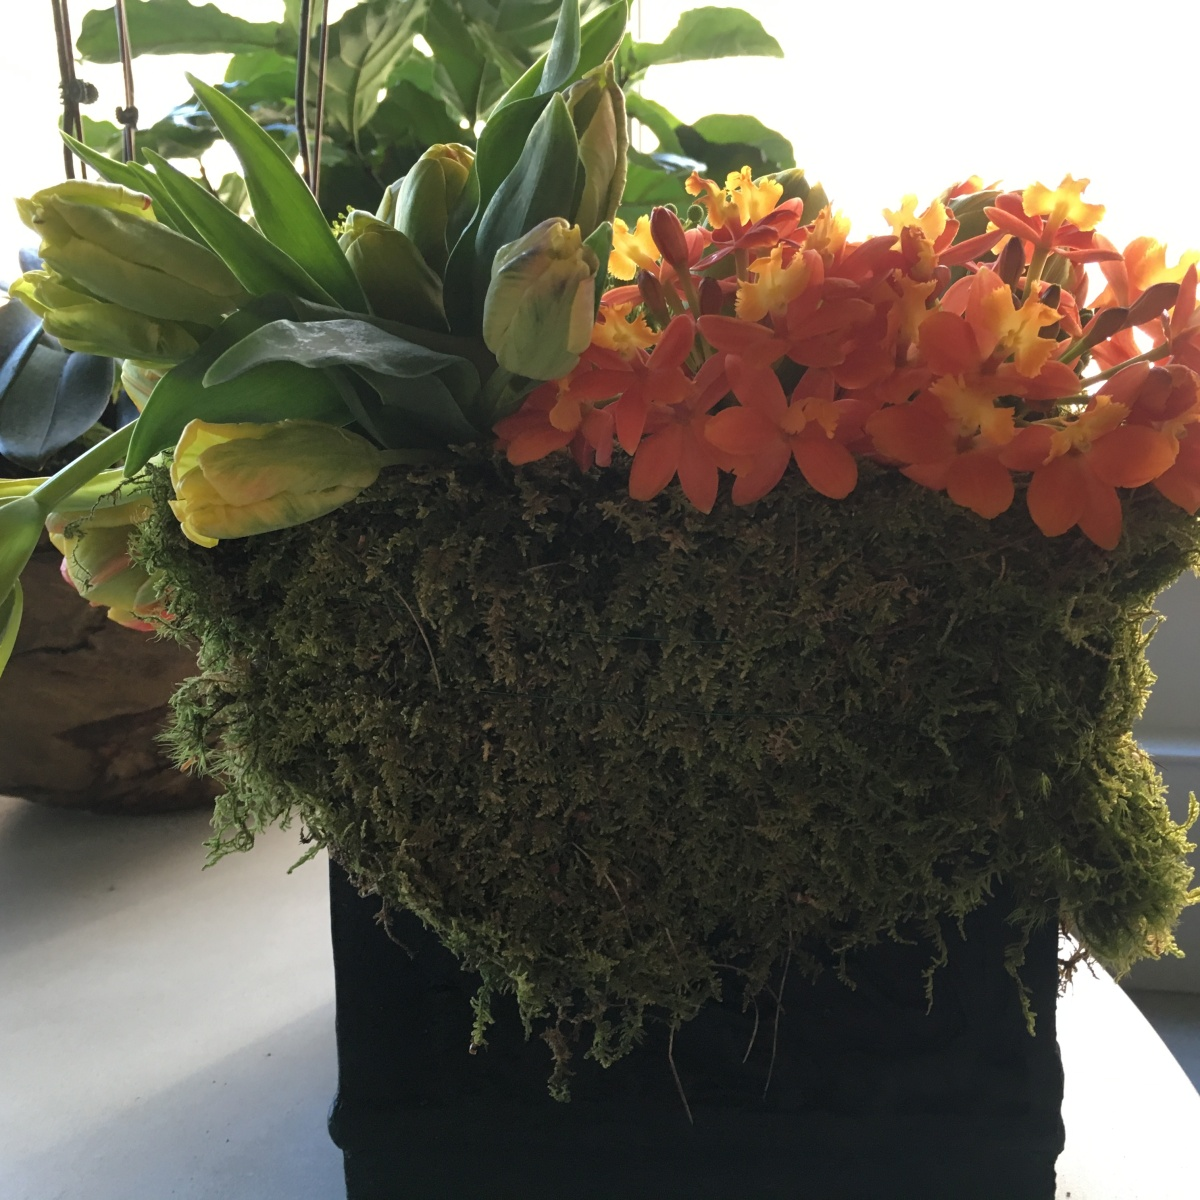 floral-cindye-spring-dinner-party-8